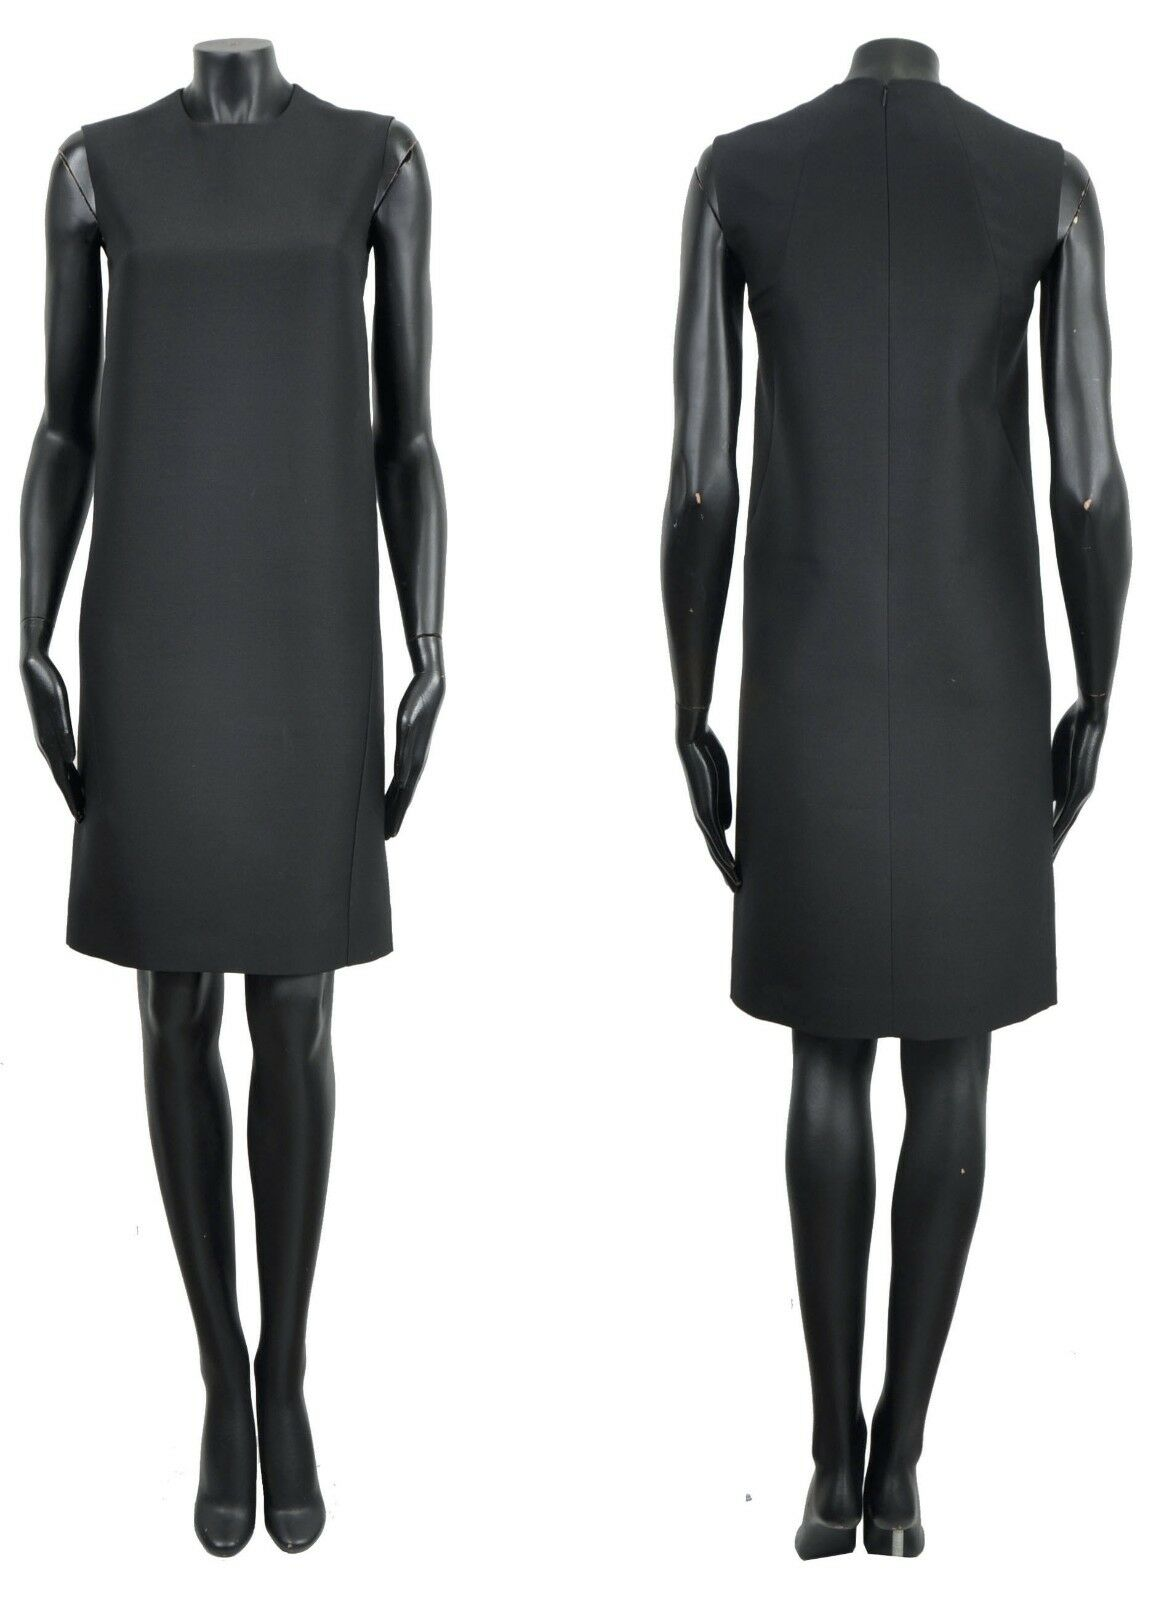 CELINE por Phoebe Philo  1500 Negro Clásico  Lana de Seda Vestido Sin Mangas Shift  grandes ofertas